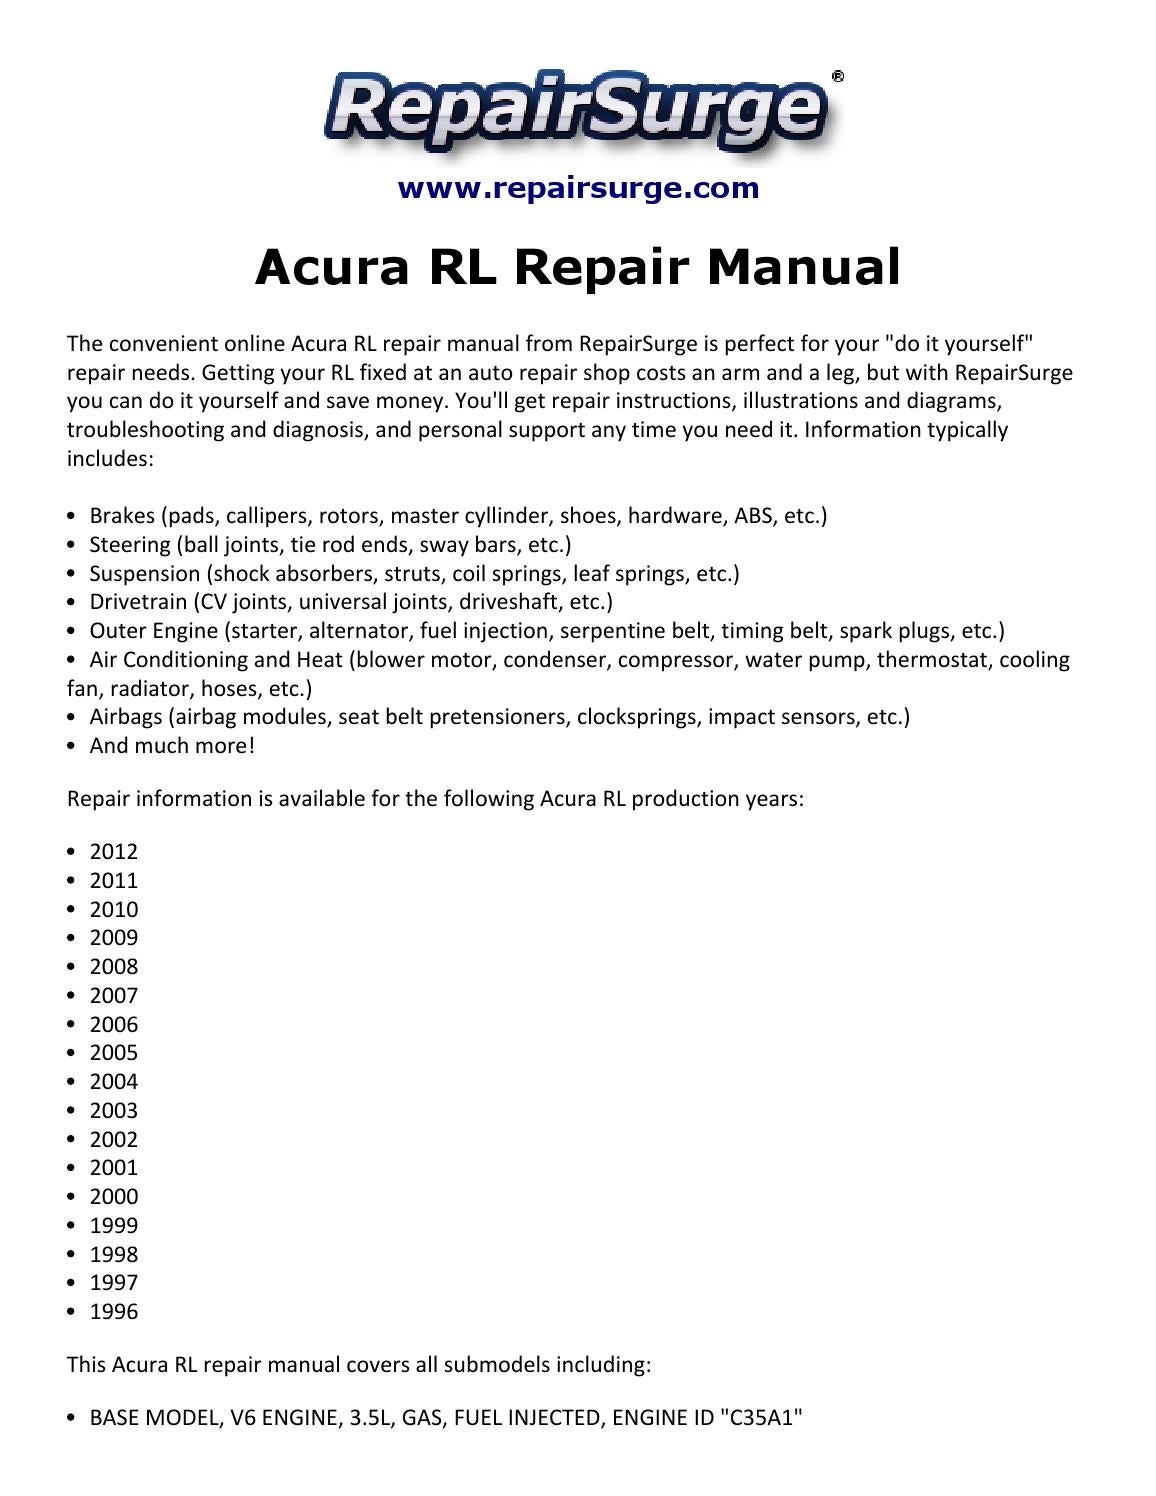 2000 acura rl manual